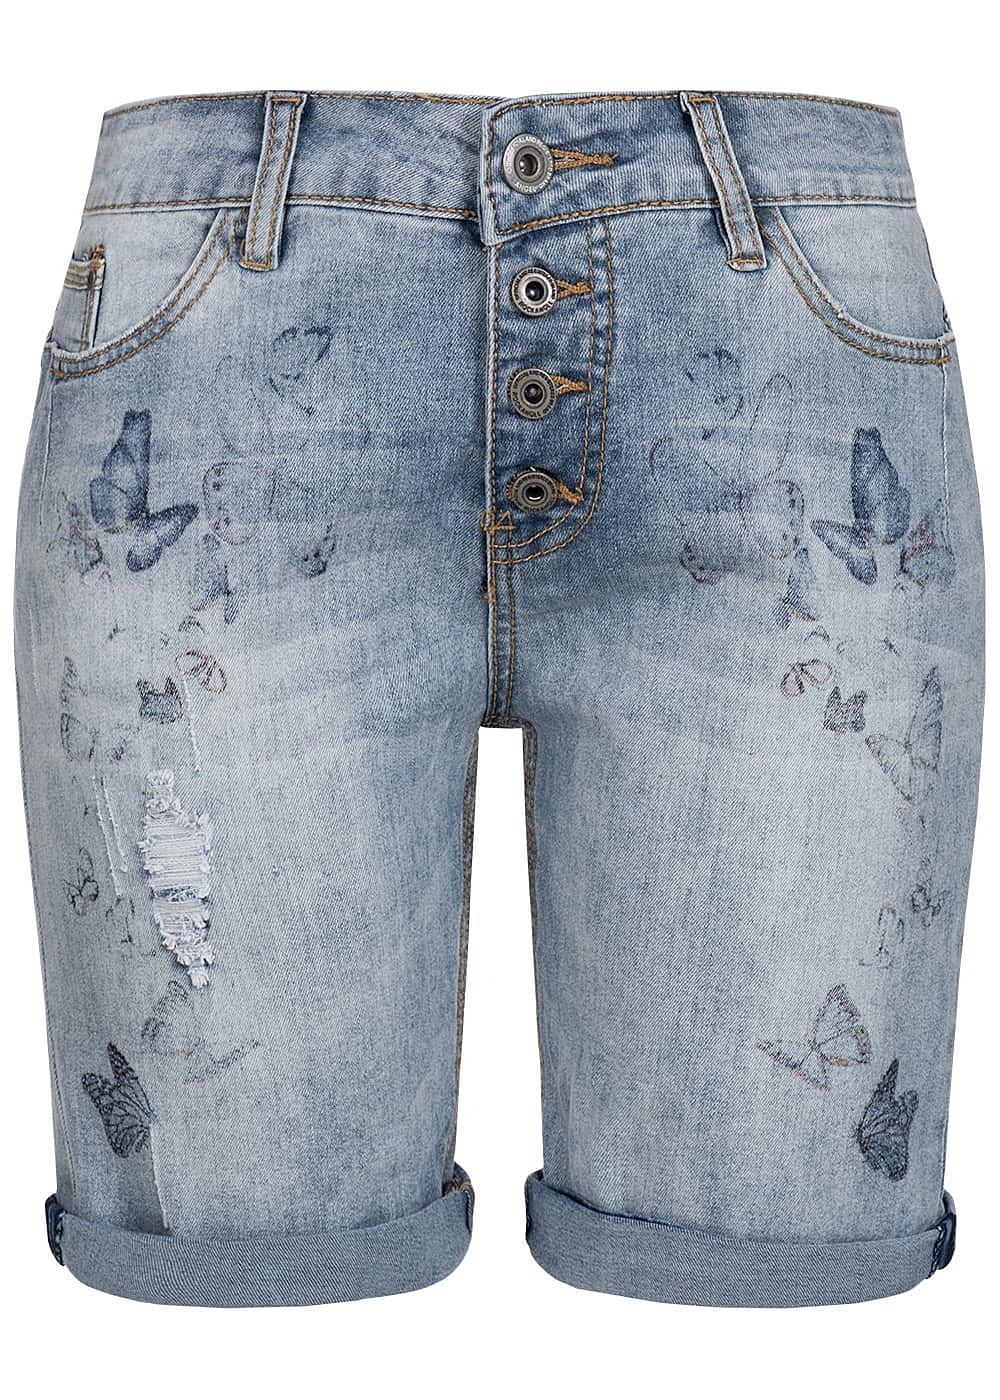 eight2nine damen bermuda jeans short 5 pockets schmetterling print by rock angel blue denim. Black Bedroom Furniture Sets. Home Design Ideas